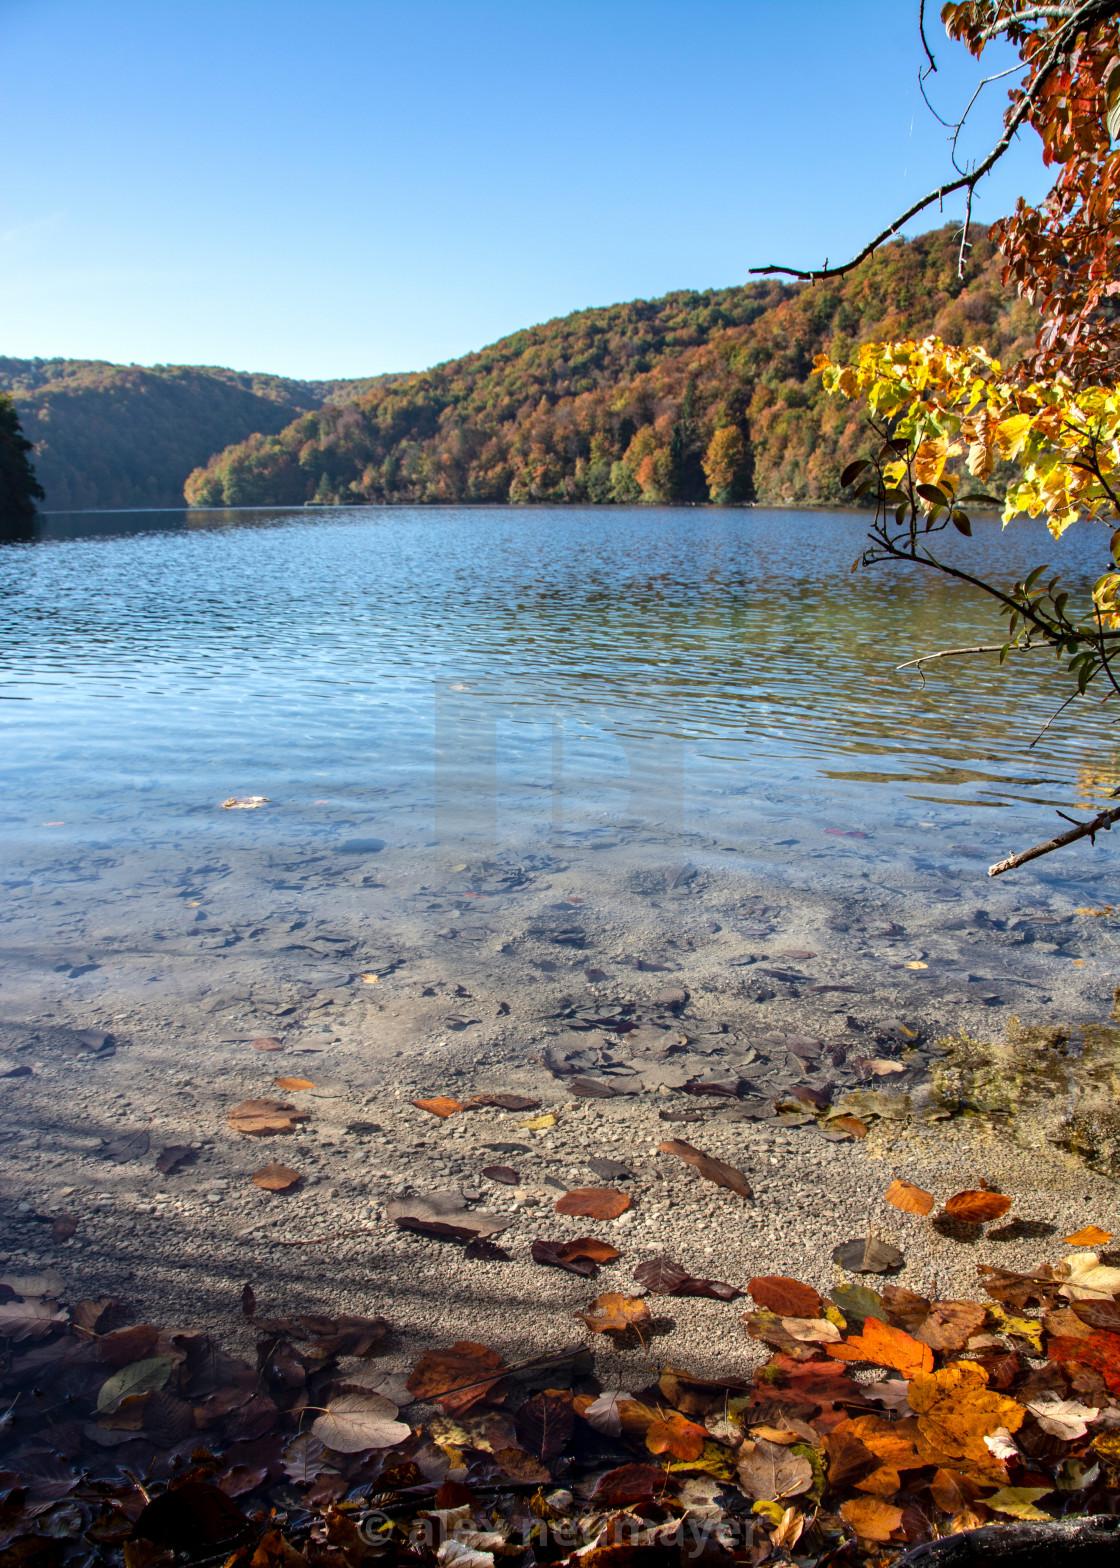 colorful autumn season at the lakes